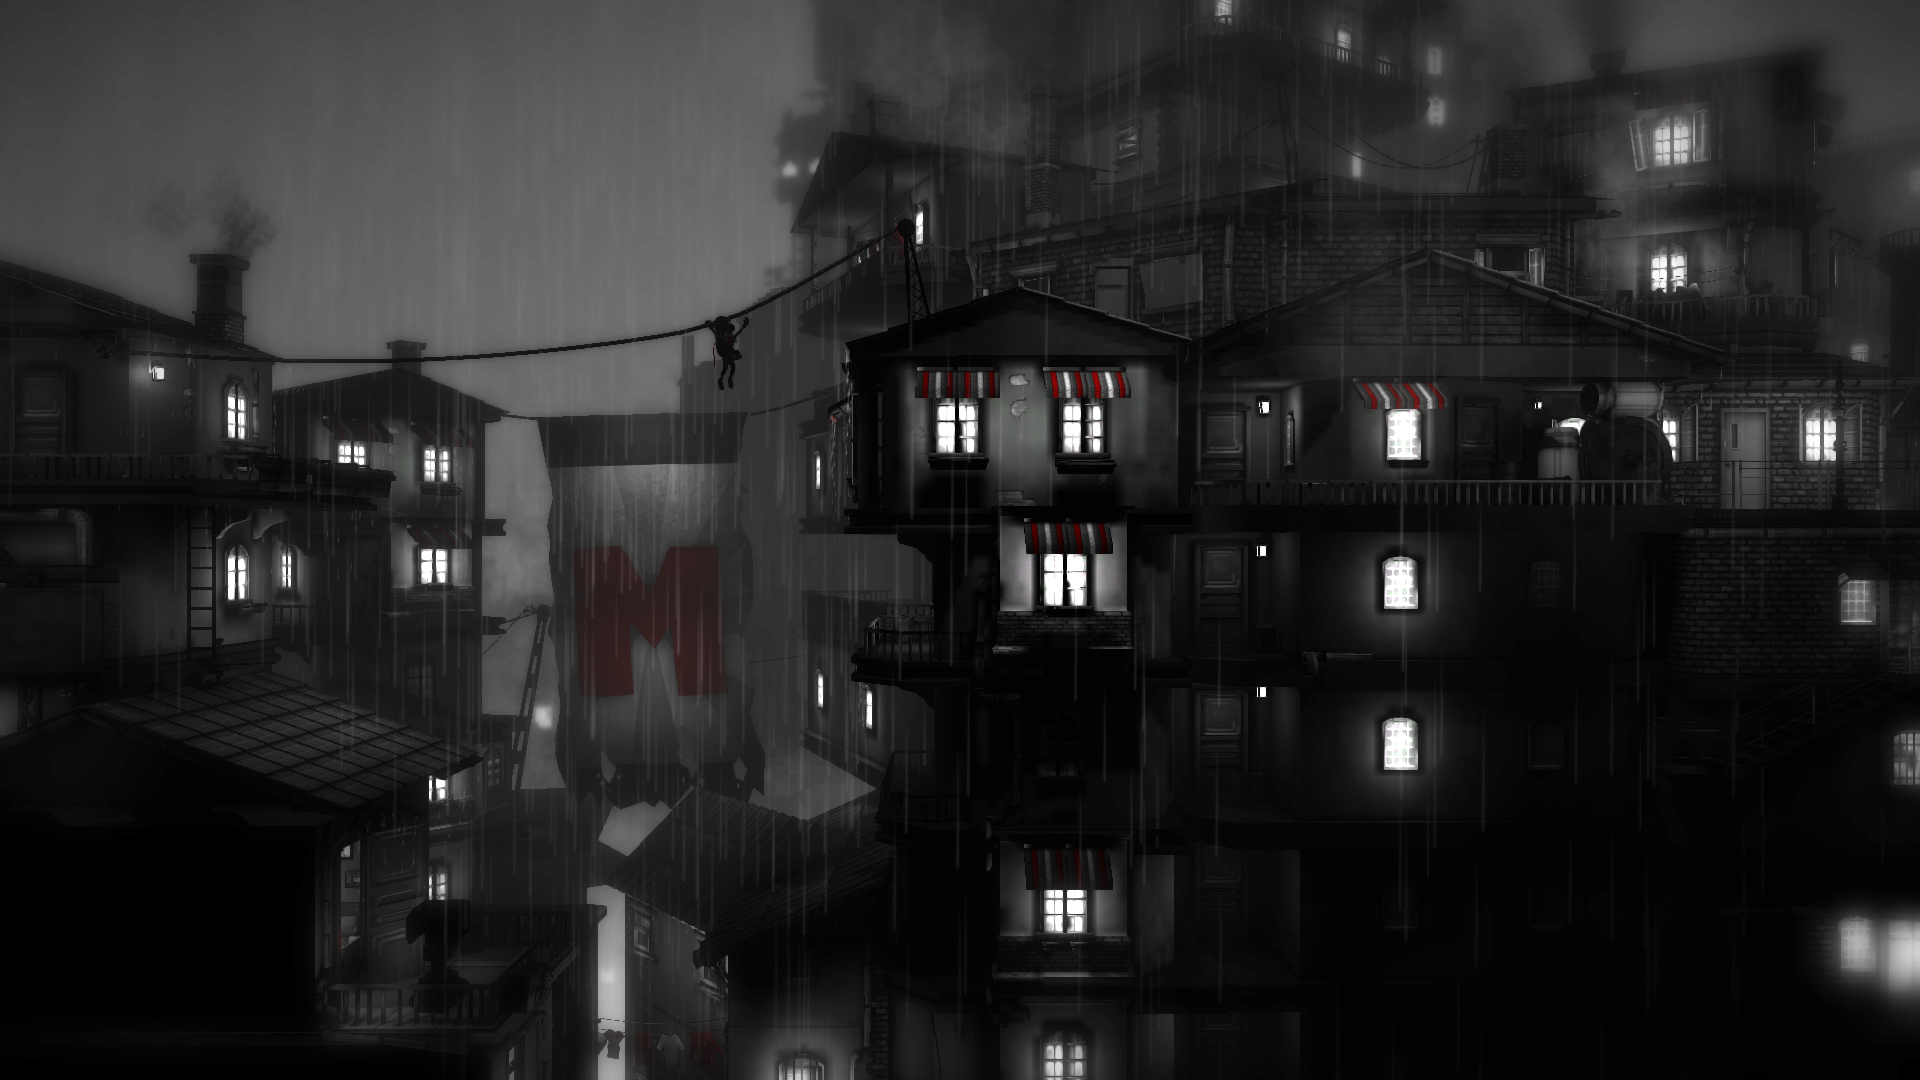 Monochroma Screenshot_1920_1080_KMZ0XLB